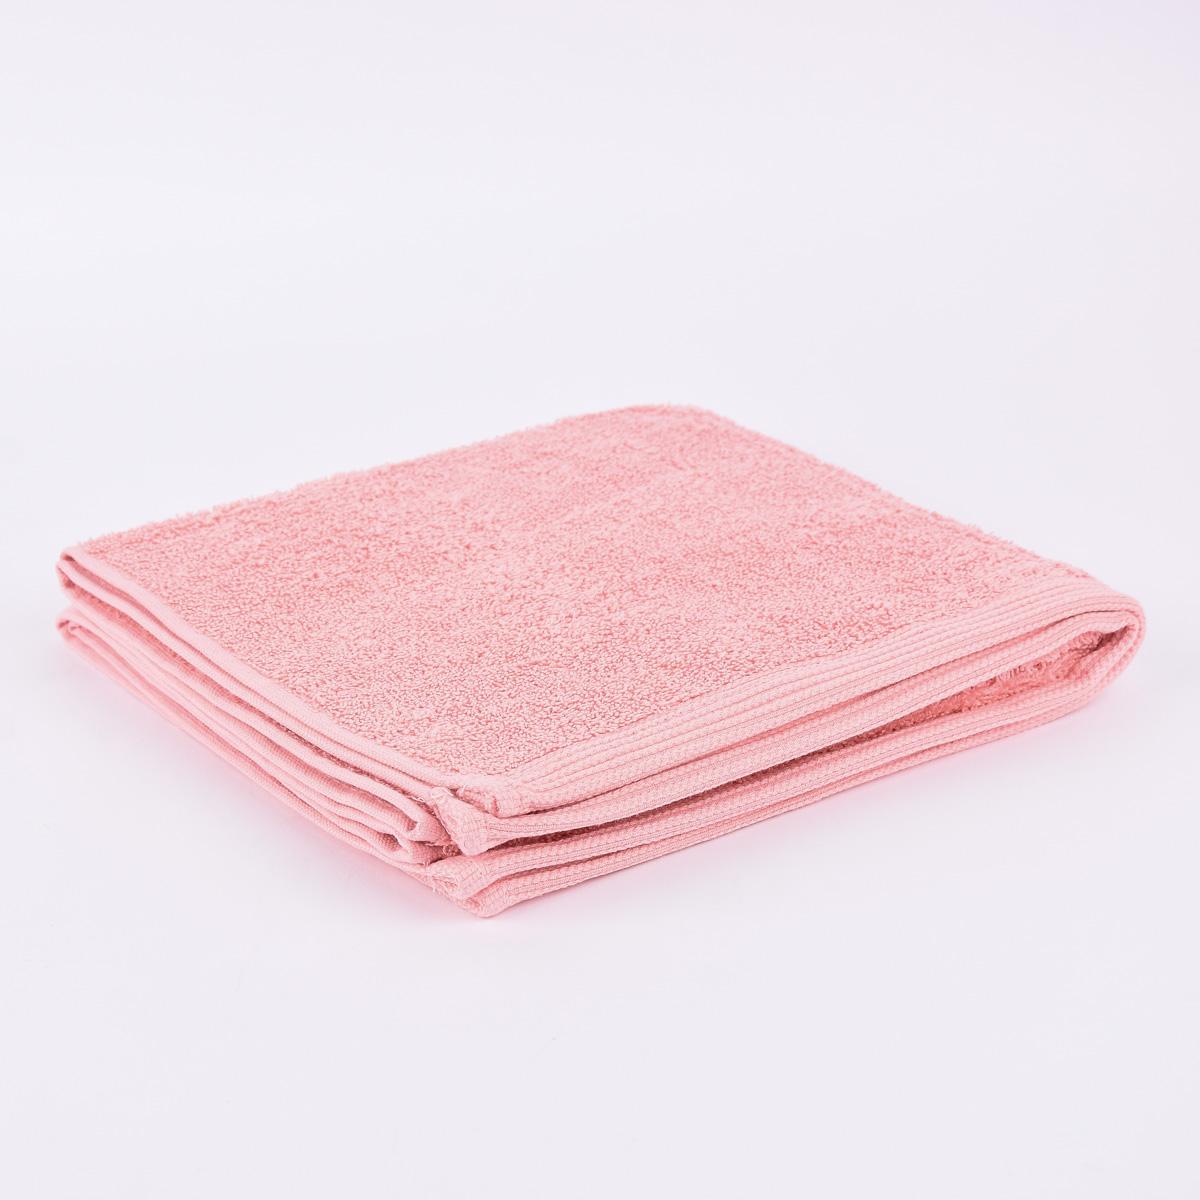 Frottee Handtuch Duschtuch Gästetuch Lachs Geschenkeria